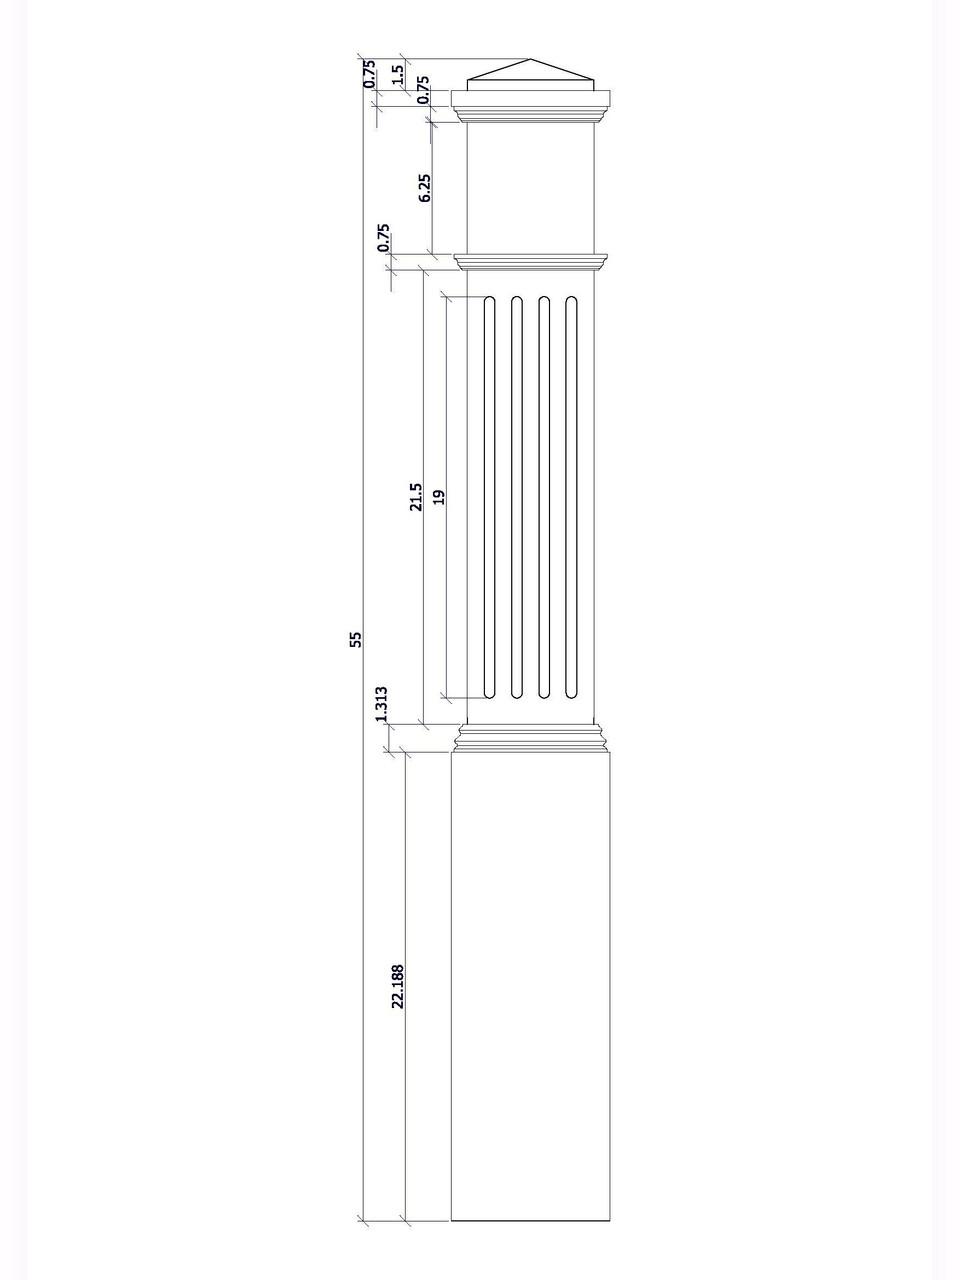 F-4092 Box Newel Post, CADD Image